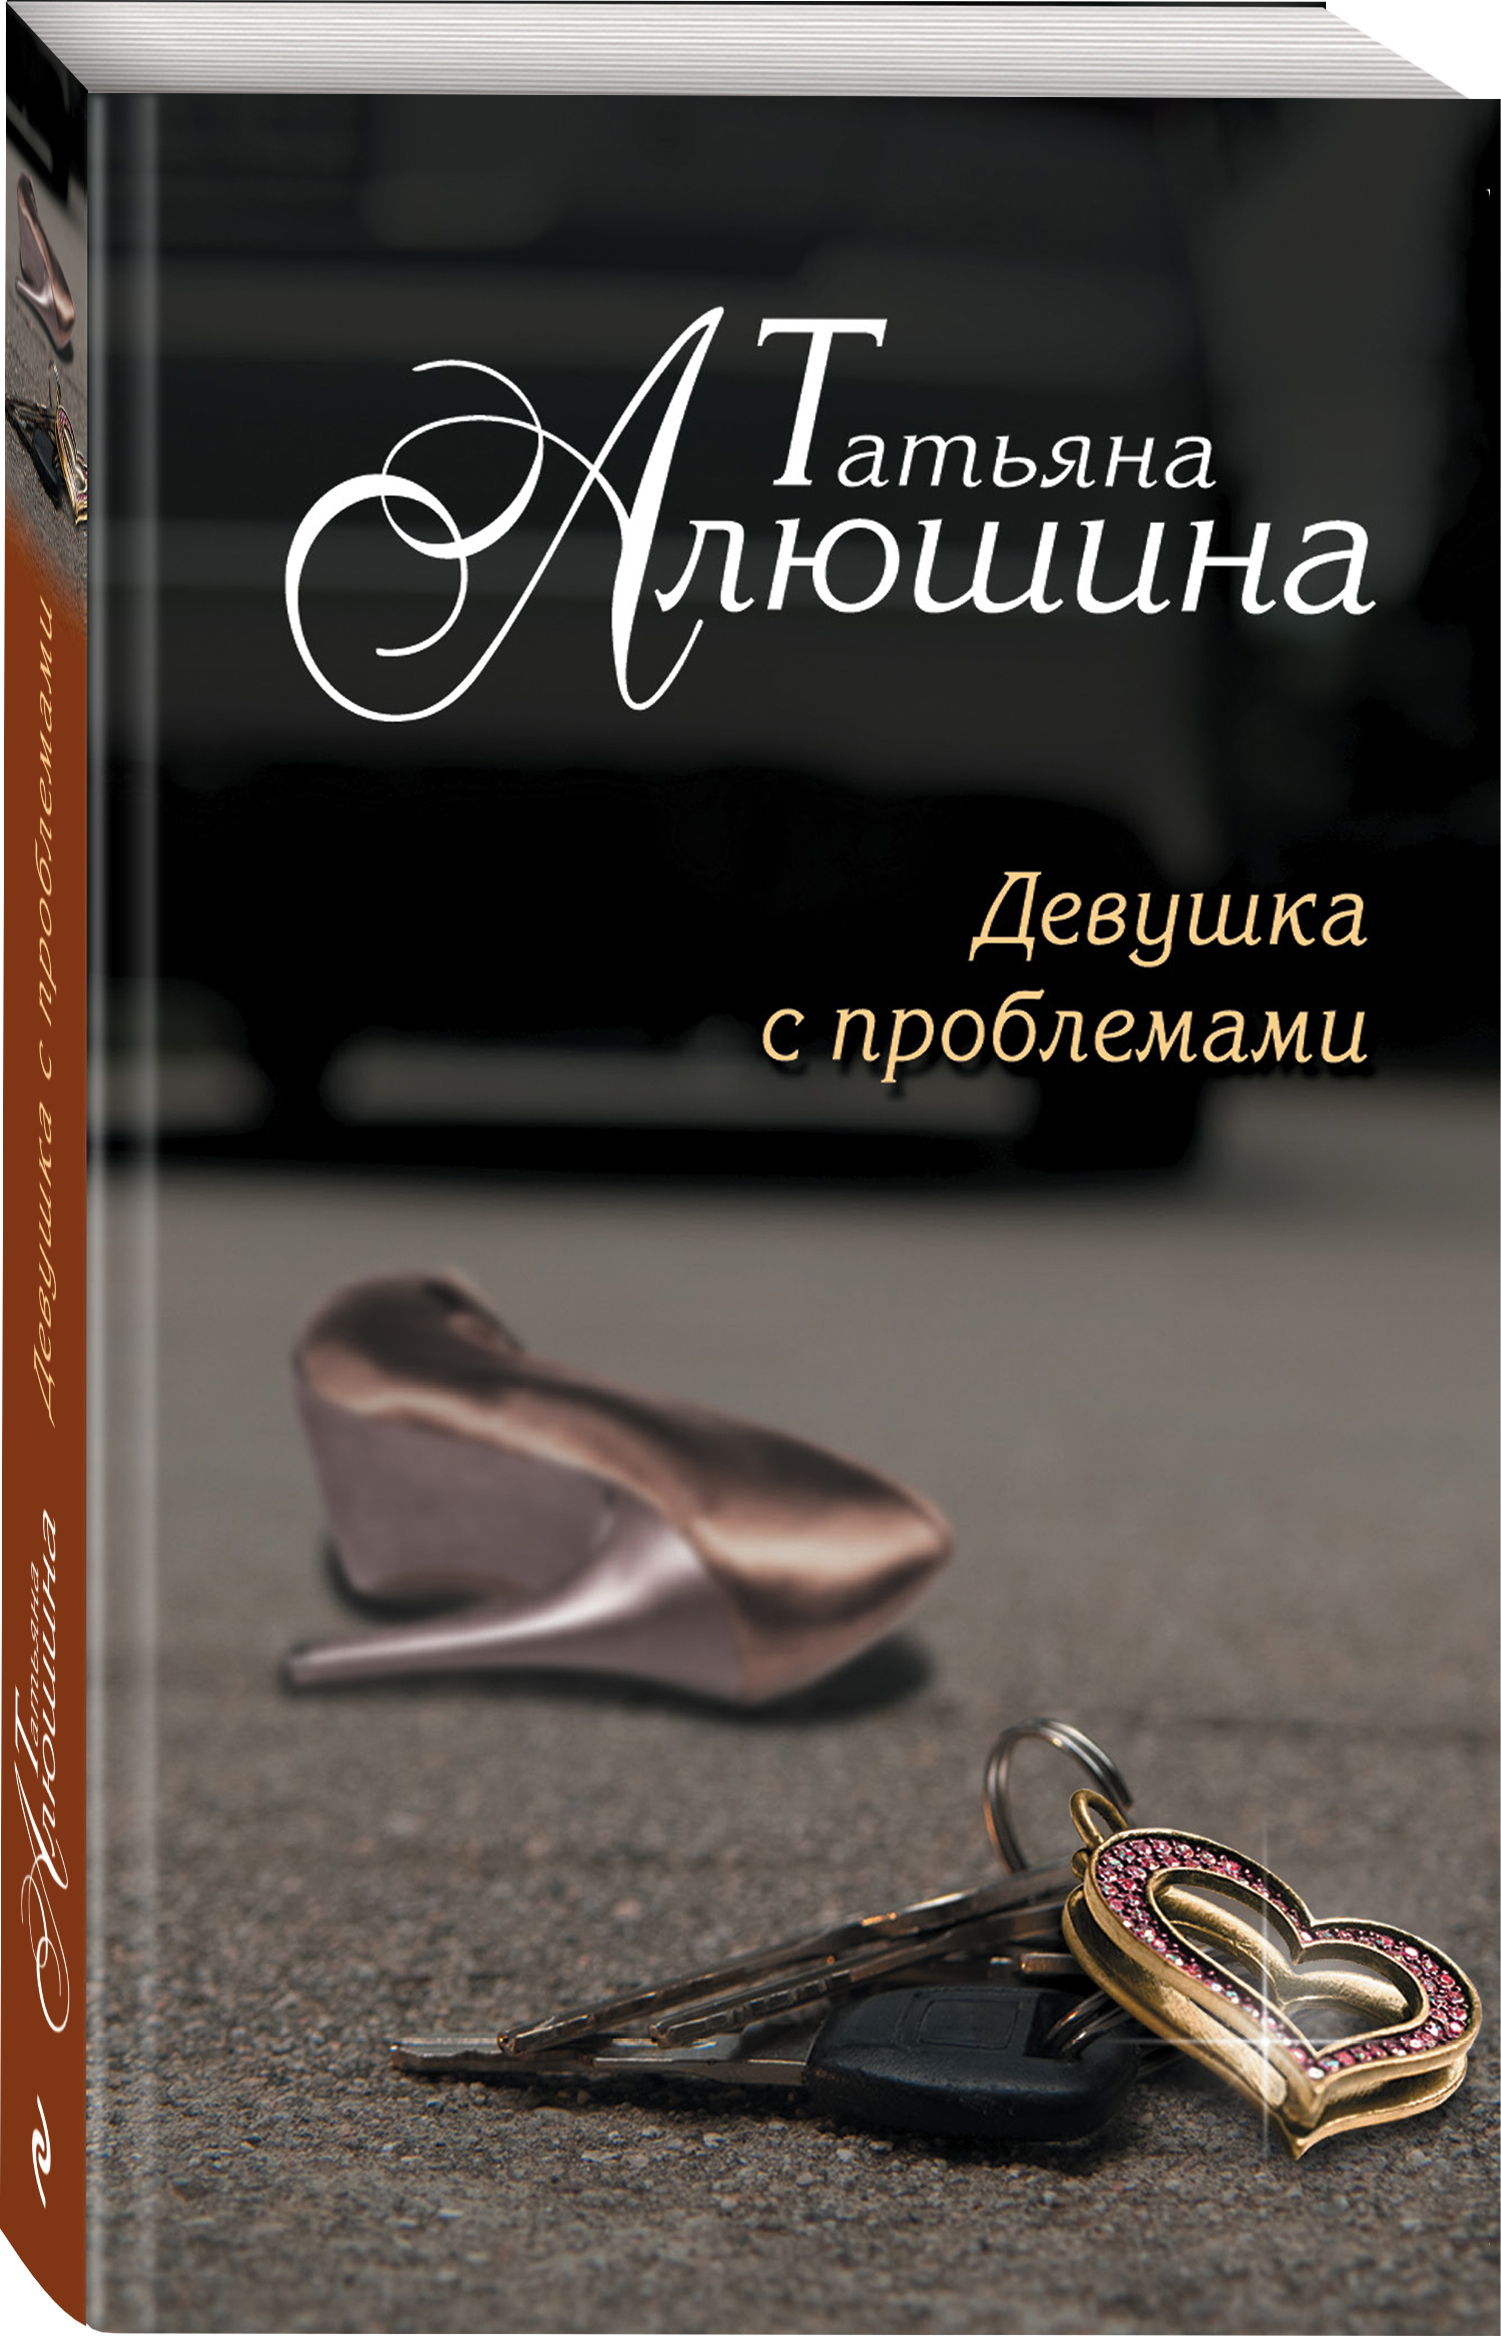 Татьяна Алюшина Девушка с проблемами